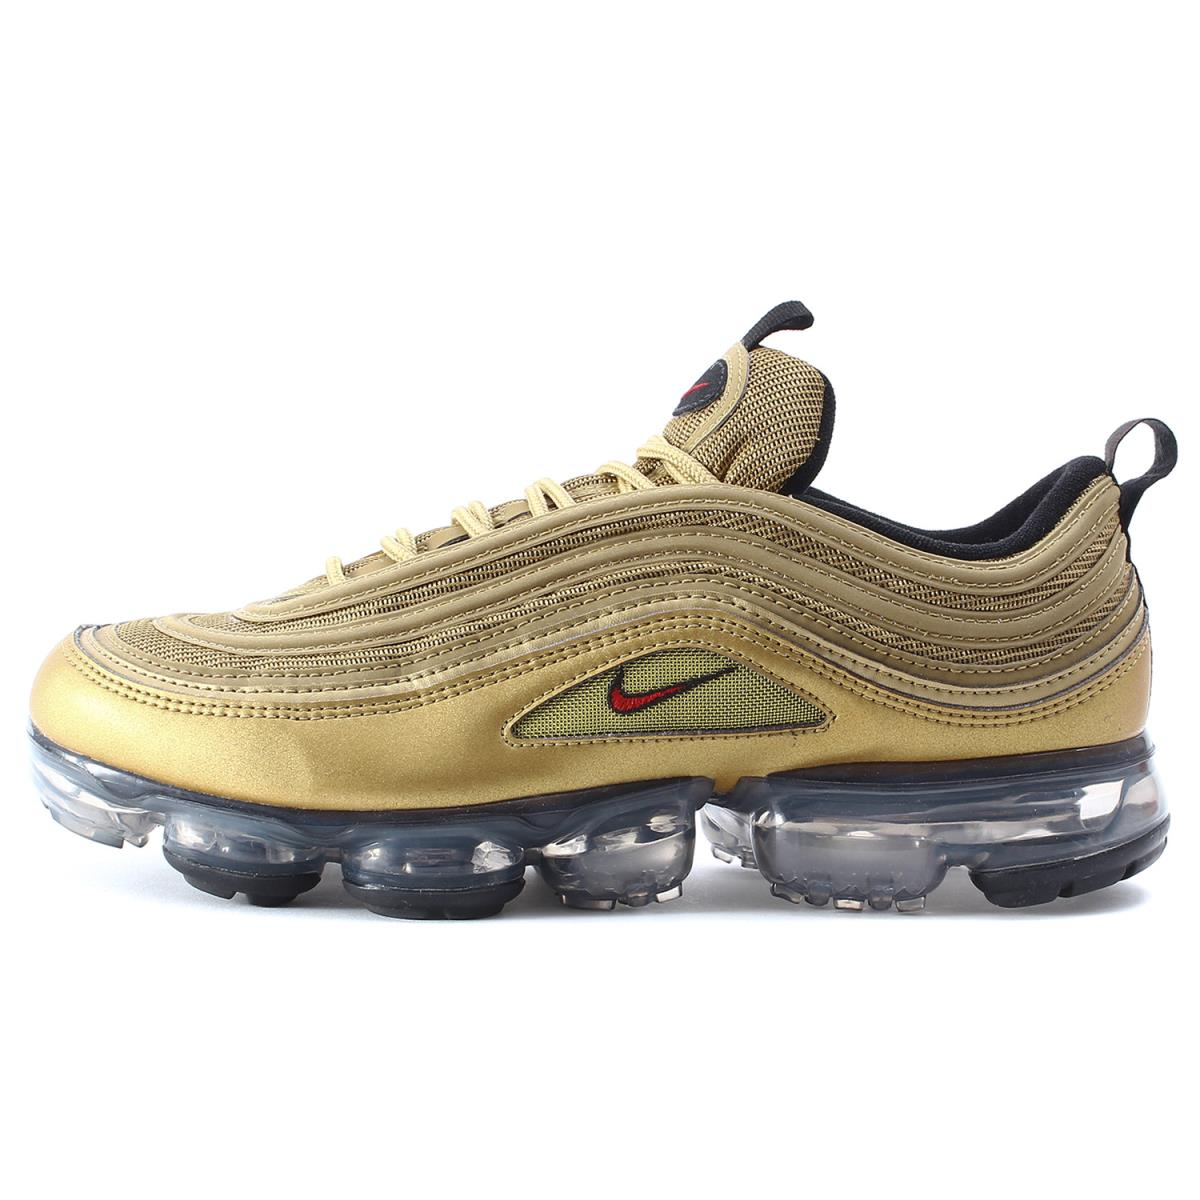 buy popular 951f2 7f04e NIKE (Nike) AIR VAPORMAX 97 METALLIC GOLD (AJ7291-700) metallic gold  US9.5(27.5cm)